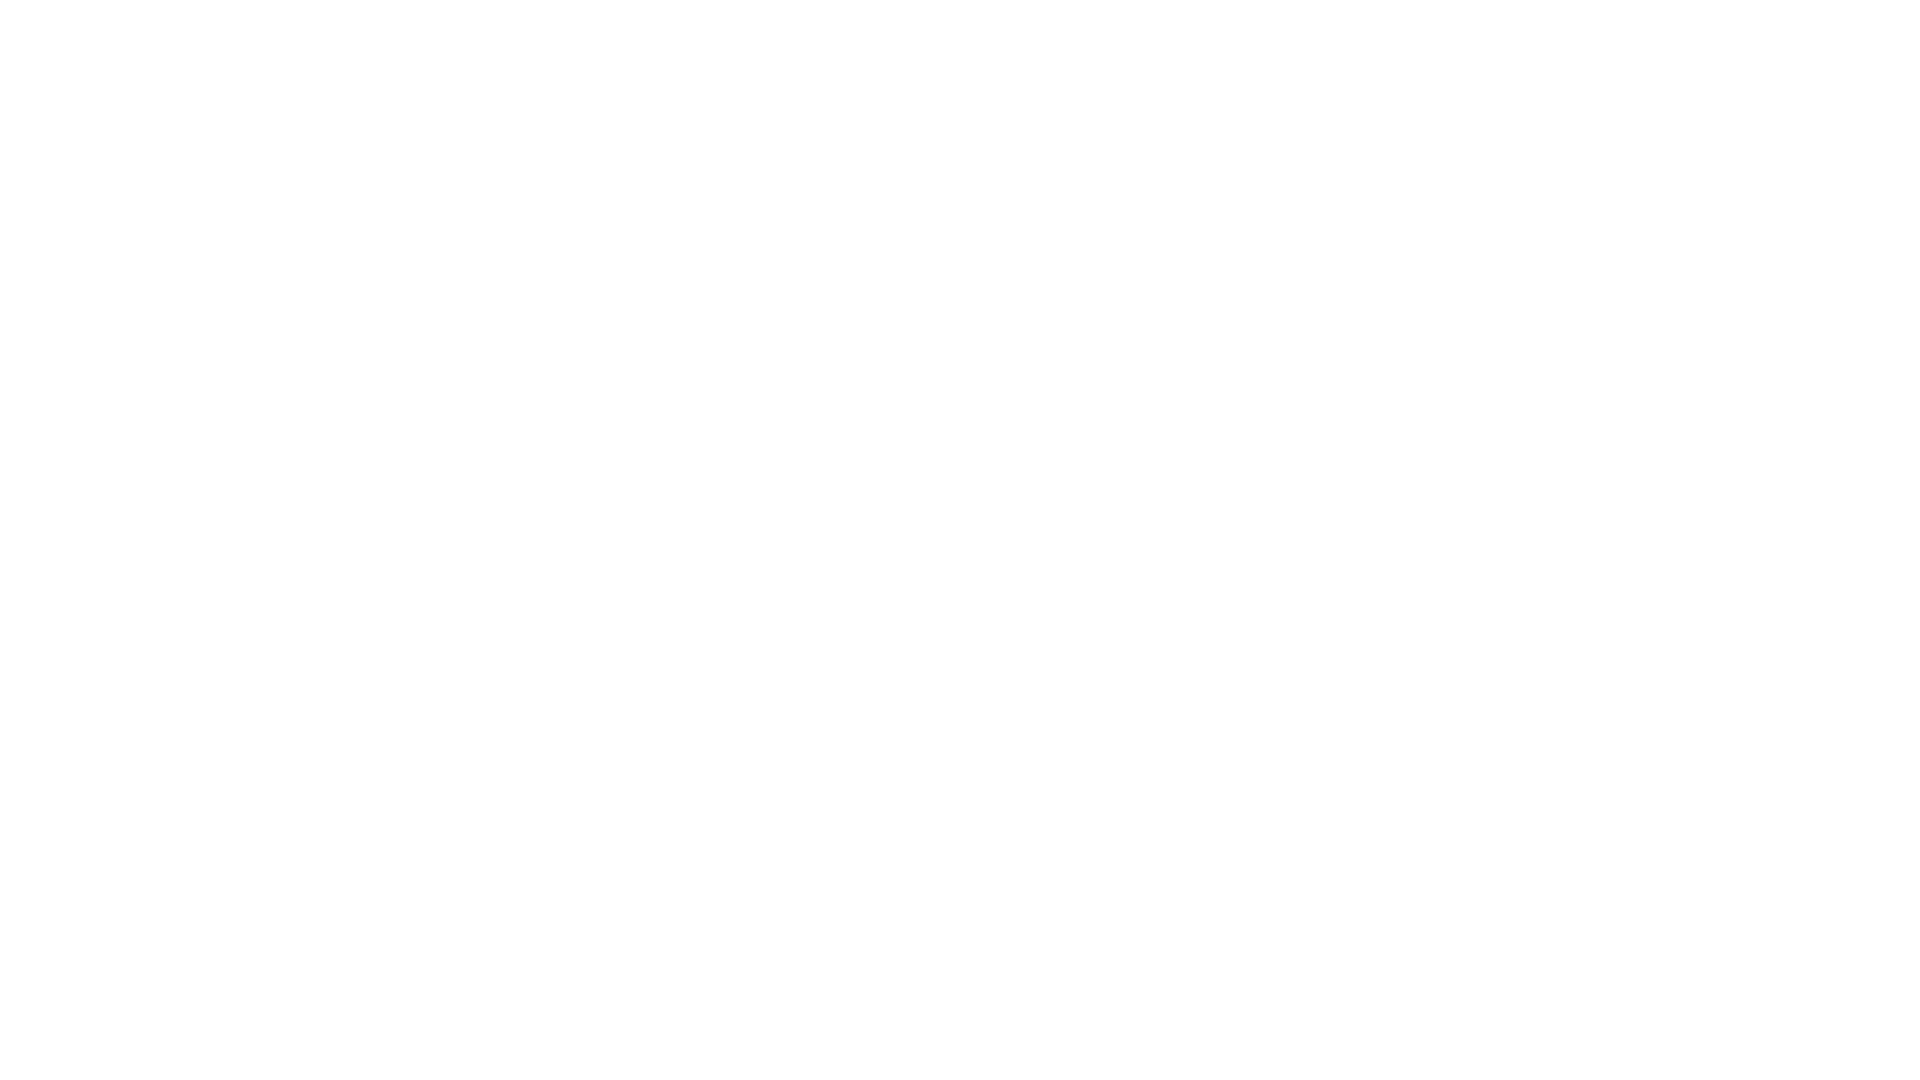 London Video Production - London Photographer - International Videographer - International Photographer Documentary Film Maker - Film Director- Music Video Director - Music Video Production - BTS Photographer - BTS Videographer - Health and Fitness Photographer - Health and Fitness Video Production - Corporate Videographer - Corporate Photographer - Event Photographer - Event Video Production - Social Media Photographer - Social Media Video Production - Technology Video Production - Technology Photographer - Fashion Photographer - Fashion Videographer - Talking Head Video Production - Events and Lifestyle Photographer - Events Video Production - Travel and Tourism Photographer - Travel and Tourism Videographer- Promotional Video Production - Aerial Photographer - Aerial Videographer - Drone Photographer - Drone Videographer